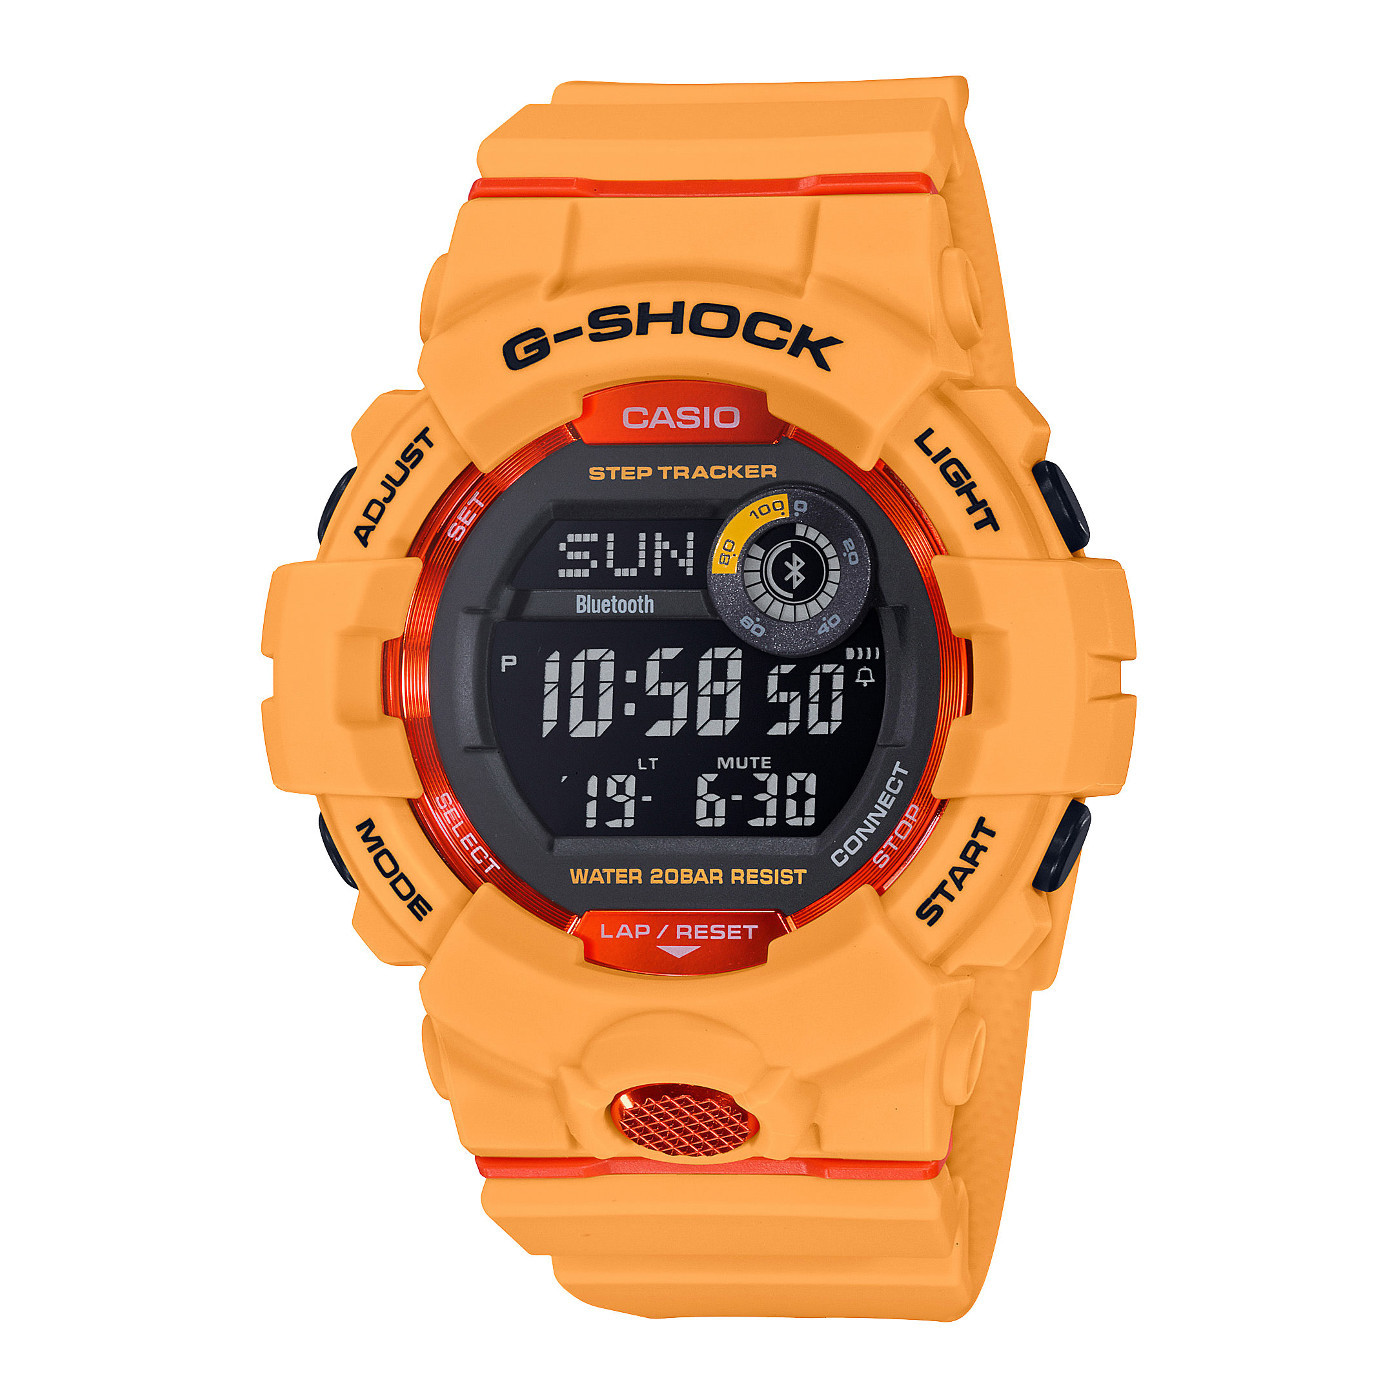 G-Shock G-Squad Stepcounter Bluetooth Connected horloge GBD-800-4ER